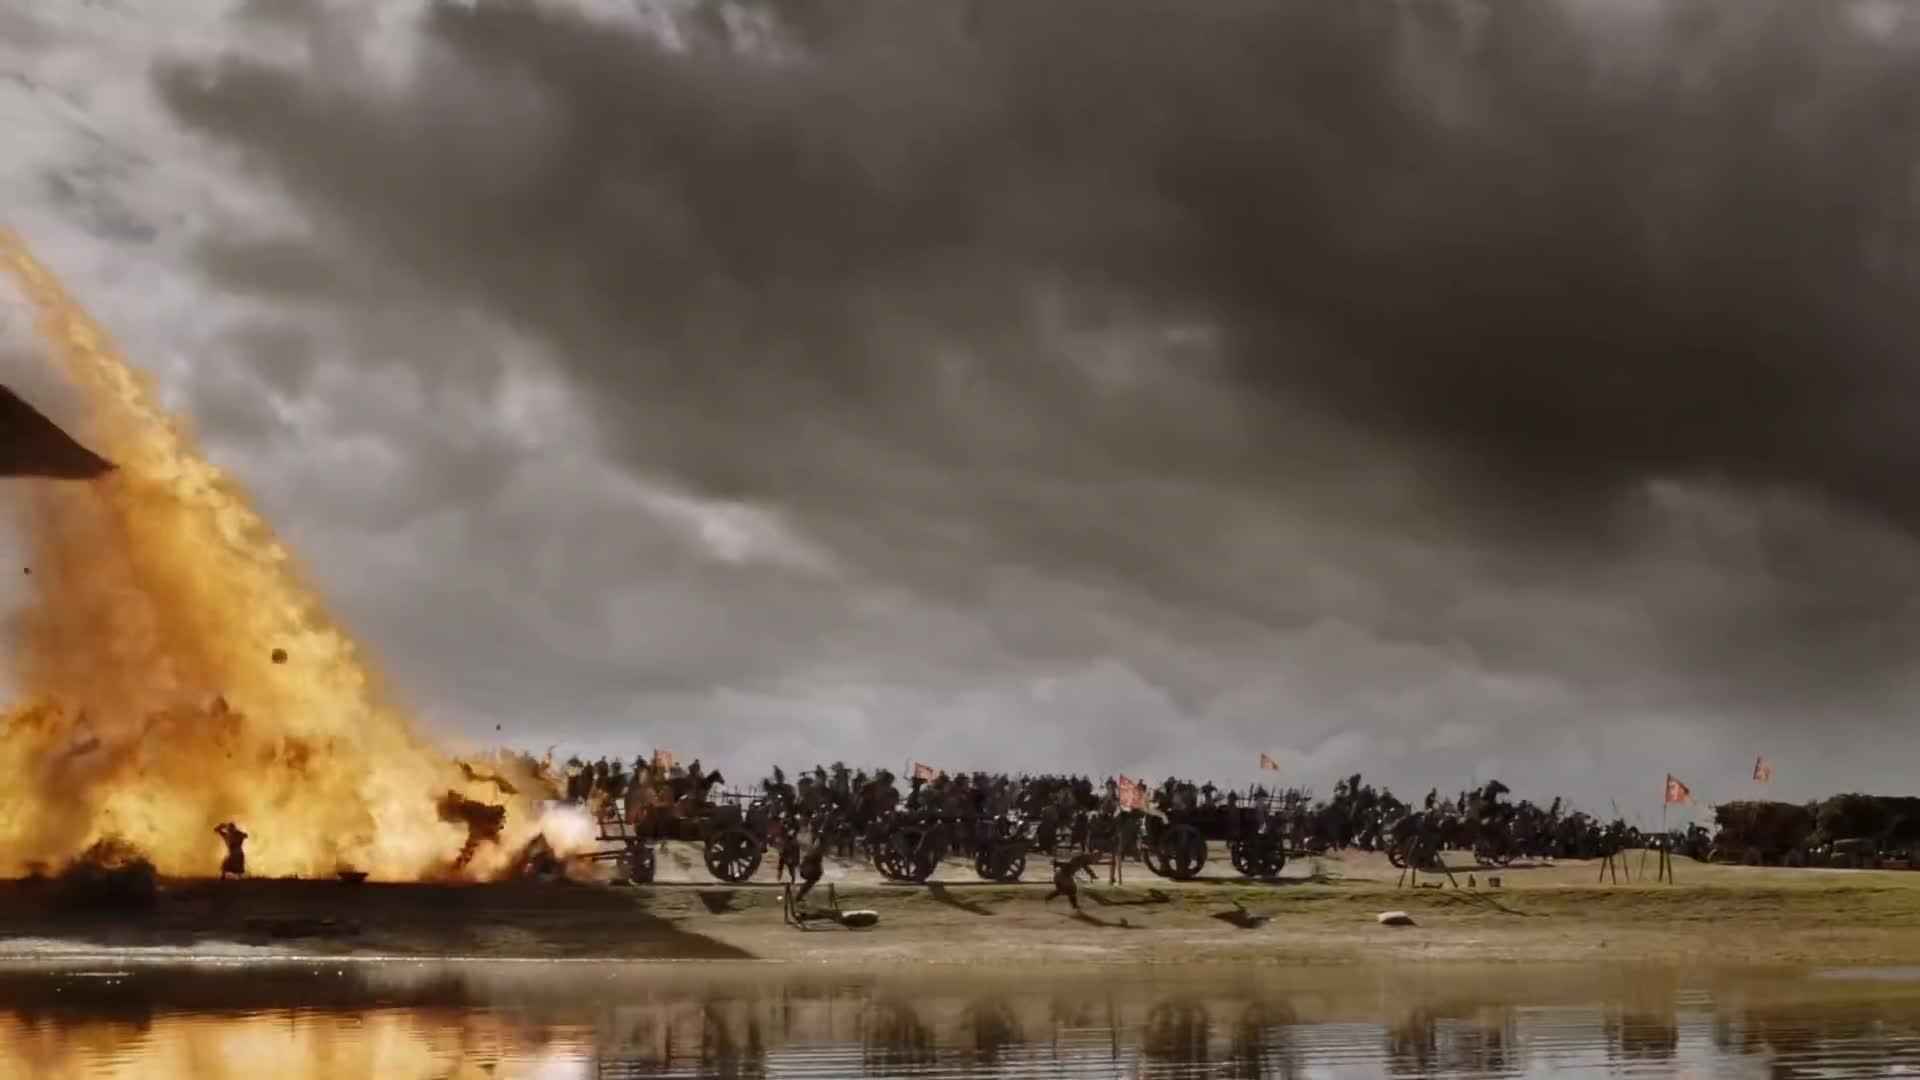 daenerys, daenerys targaryen, game of throne, game of thrones, game of thrones scene, games of throne, games of thrones, seasn 7, the game of thrones, the game of thrones scene, B-11 StrikeForce GIFs